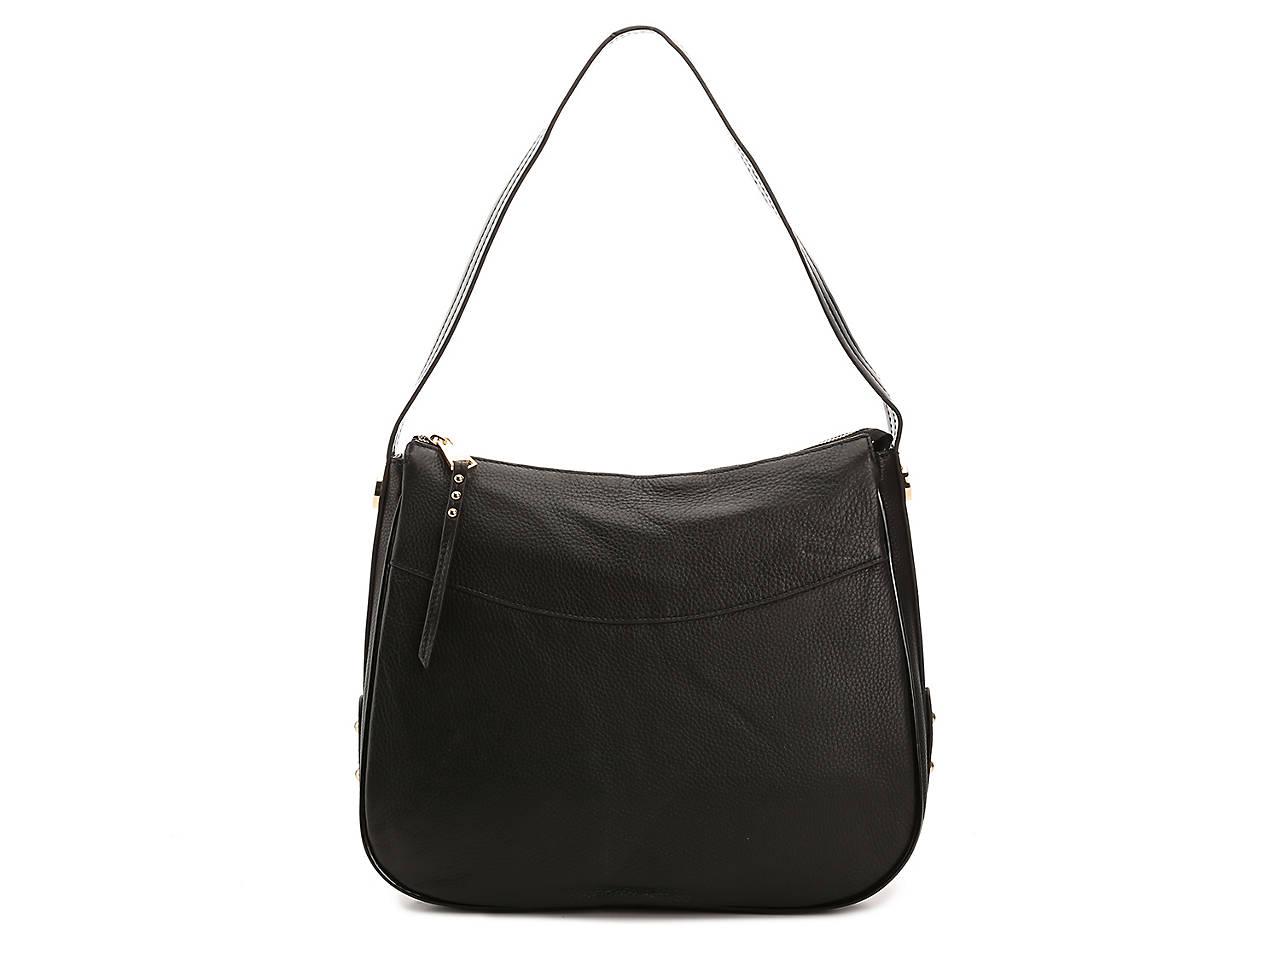 Perlina Krista Leather Shoulder Bag Women s Handbags   Accessories  9b2f7d19483ce